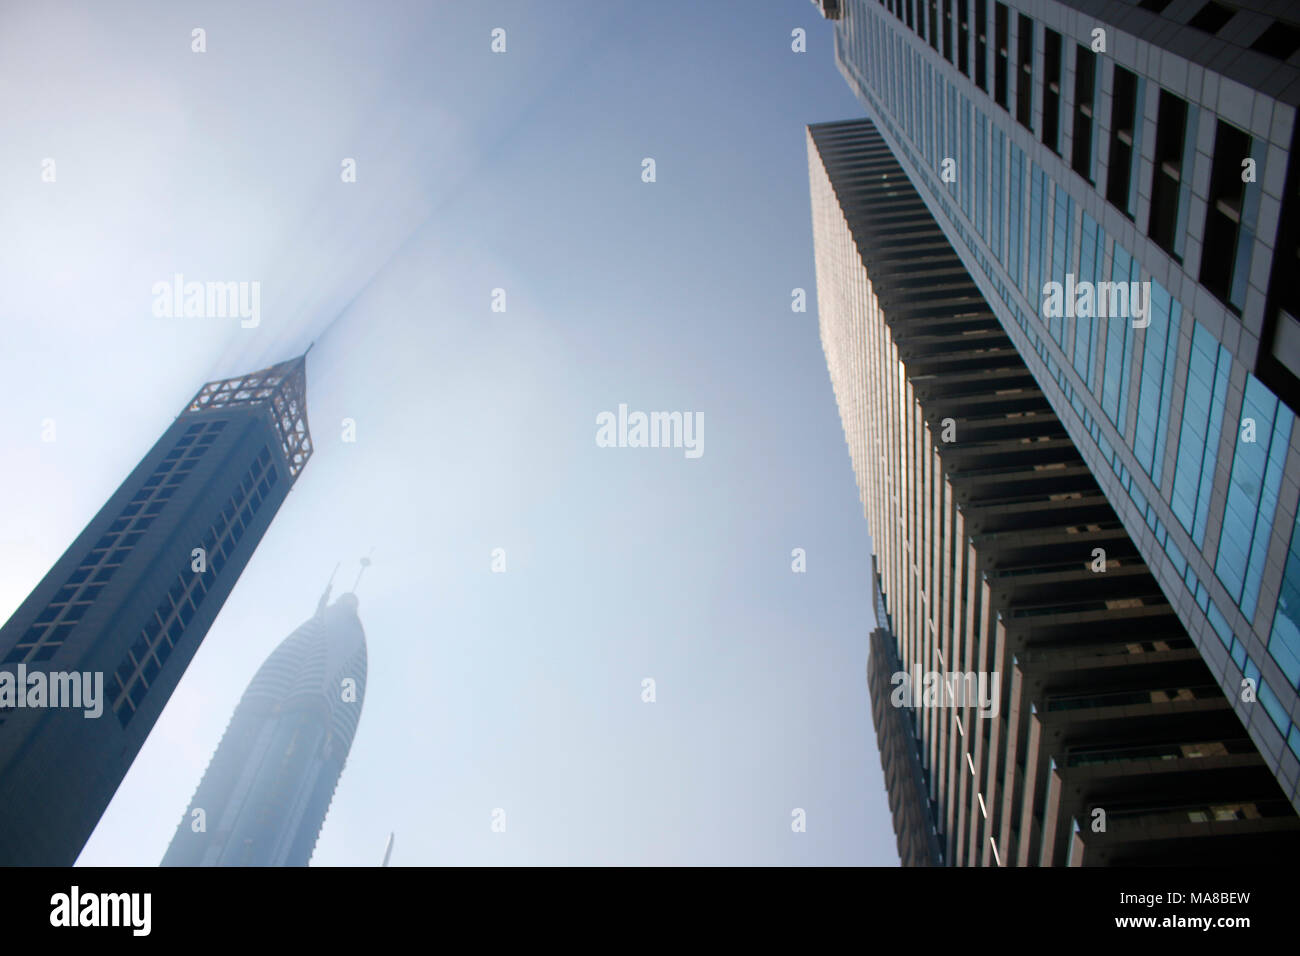 Impressionen: Wolkenkratzer, Downtown, Dubai. - Stock Image